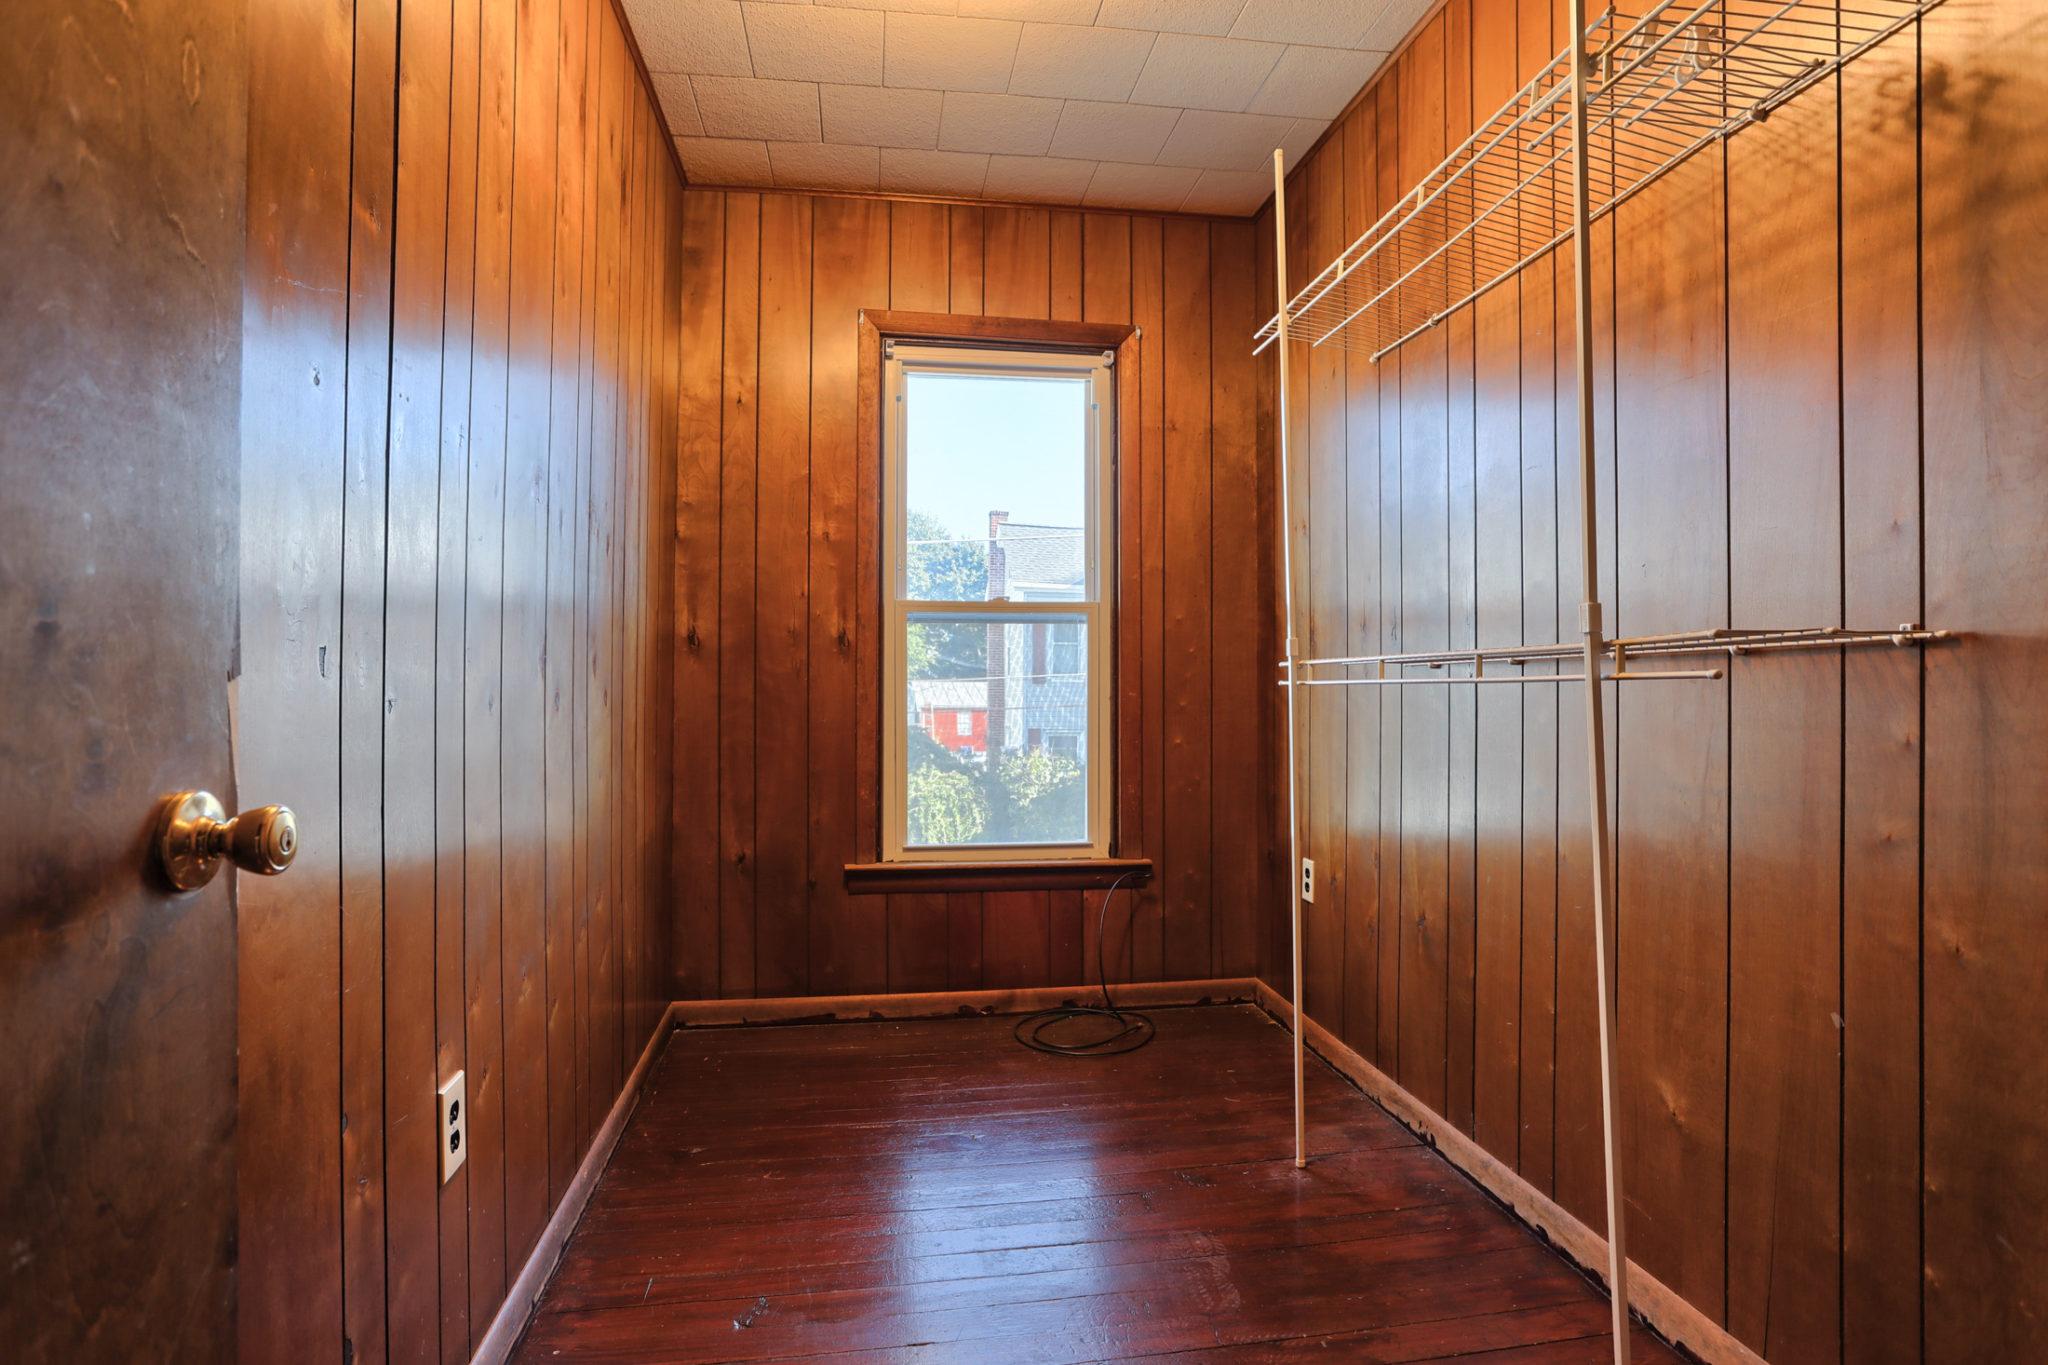 12 E. Maple Avenue - Hall entered closet